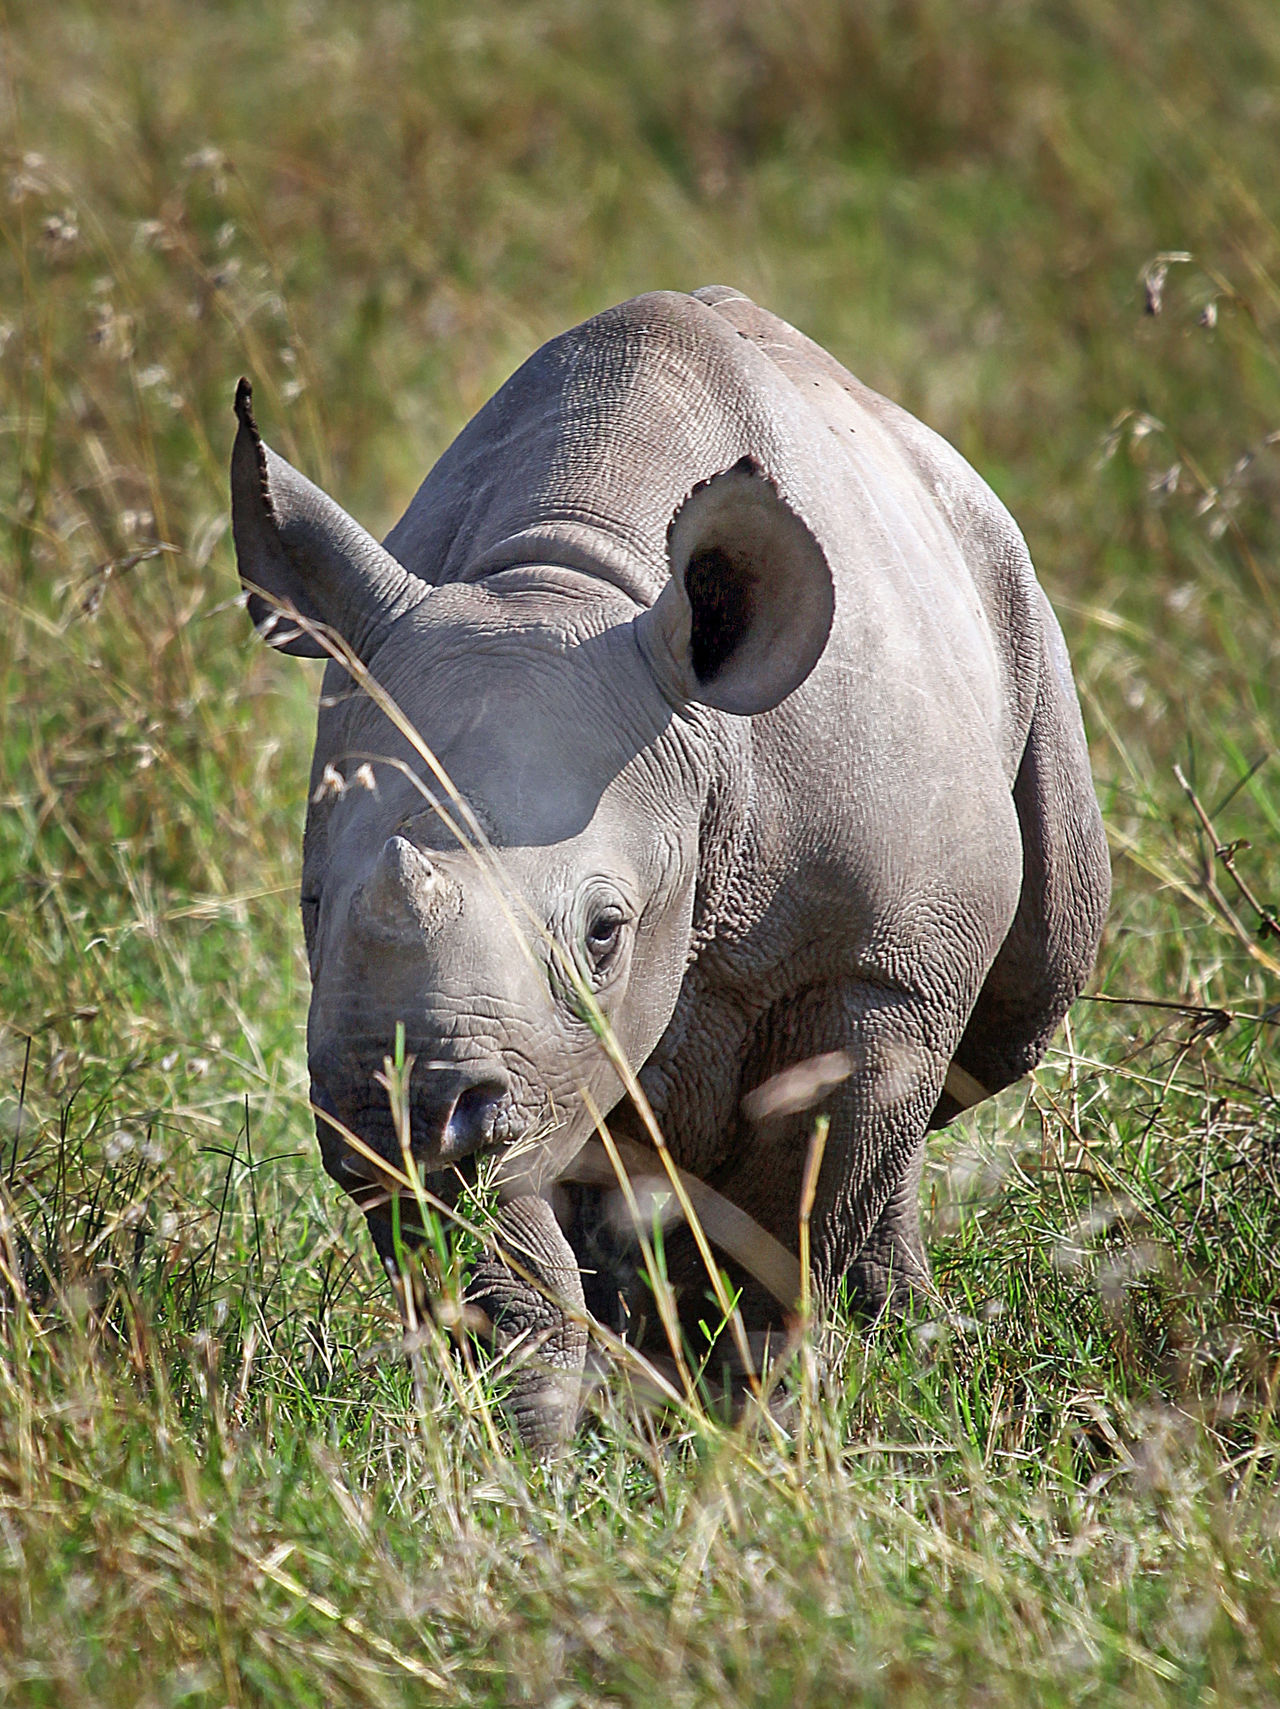 Black Rhino Calf on the plains in the Msai Mara, Kenya Animal Themes Animal Wildlife Animals In The Wild Baby Black Rhino Black Rhinoceros Calf Close-up Grass Kenya Mammal Masai Mara National Park Nature No People One Animal Outdoors White Rhino